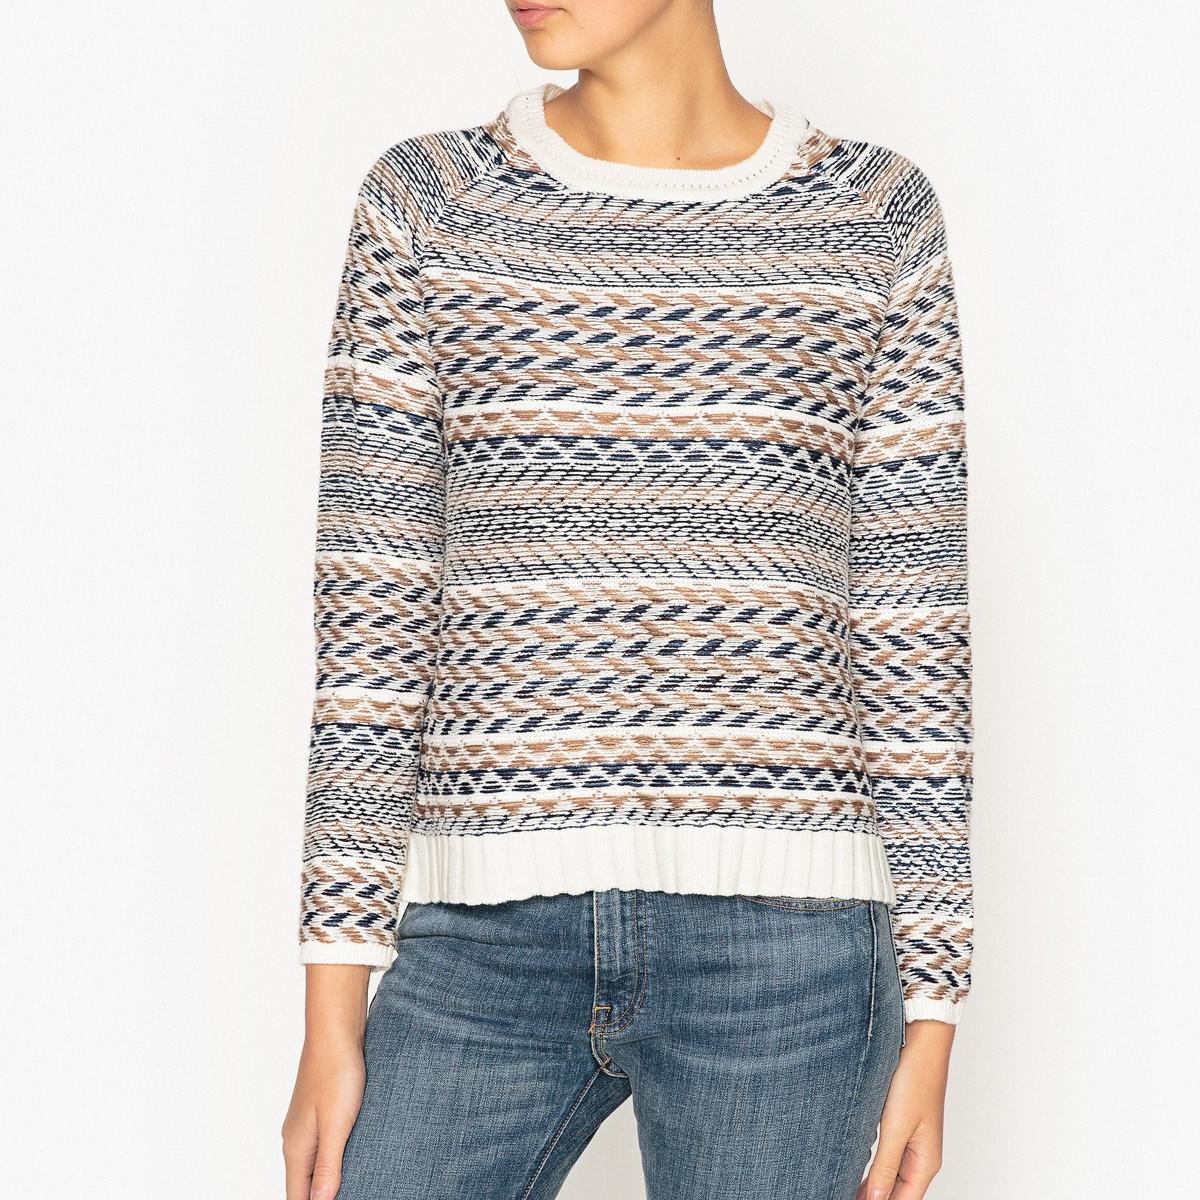 Пуловер жаккардовый трикотажный CHENE